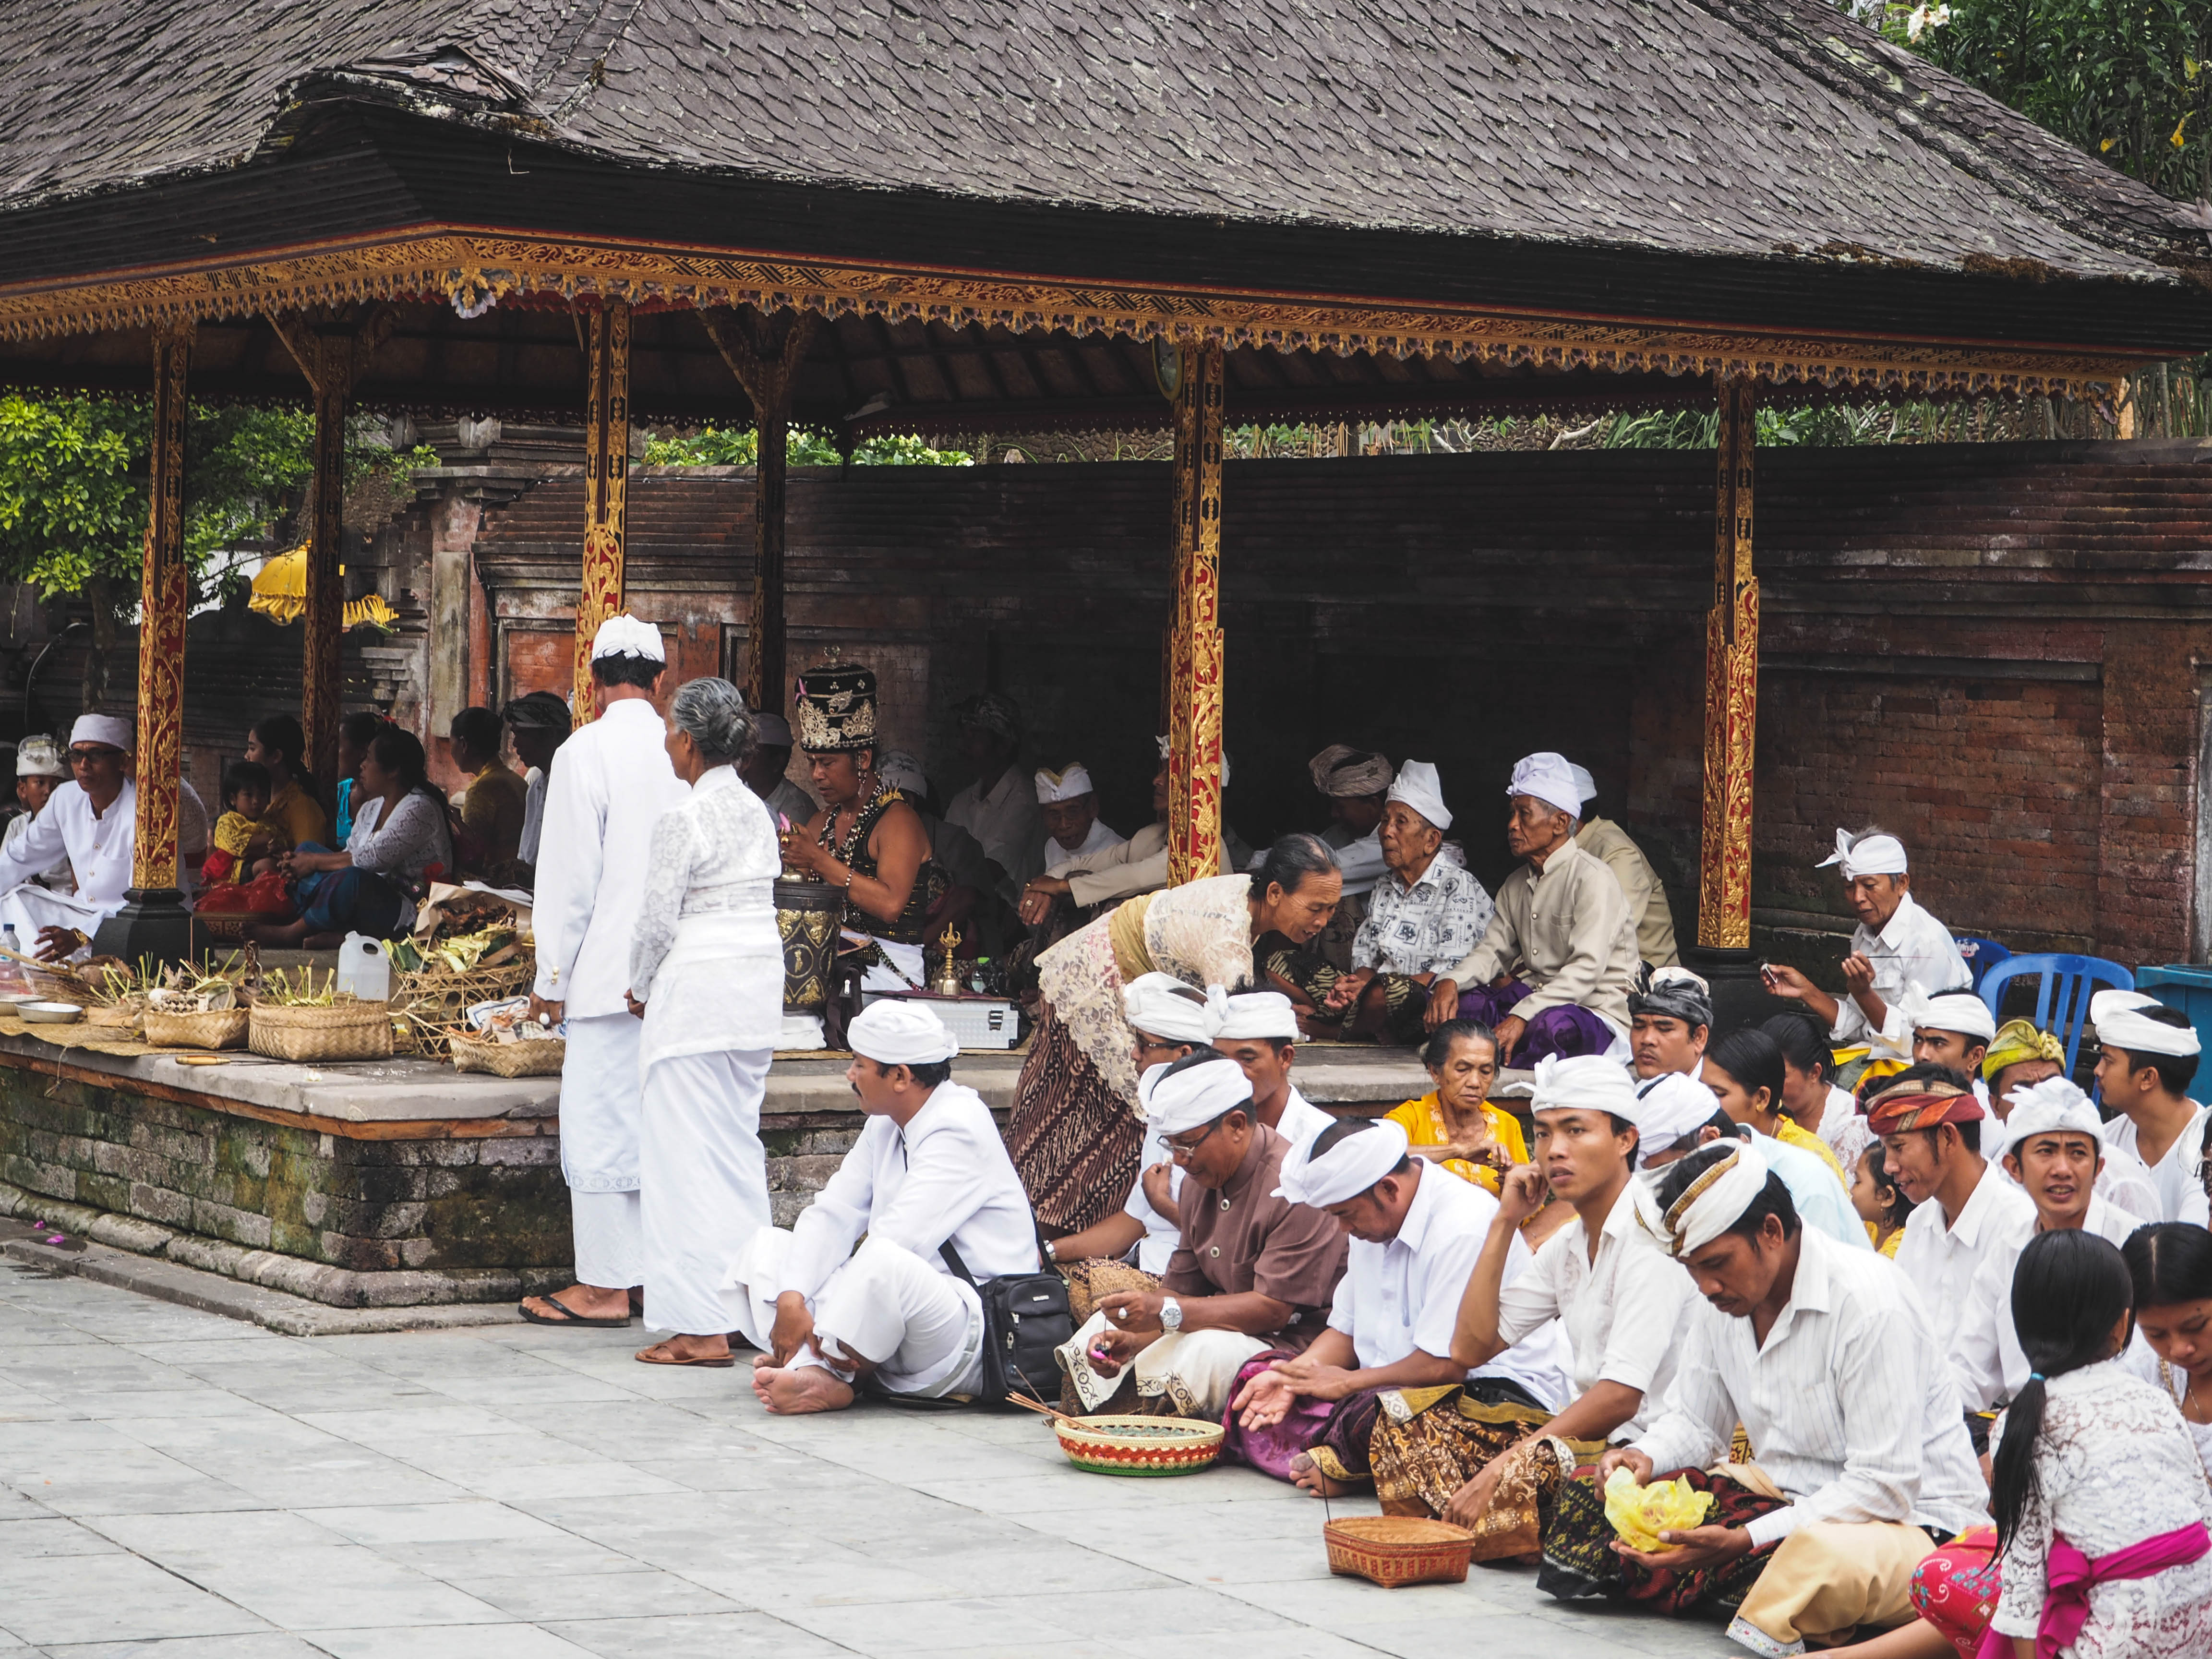 Bali: Restaurants & Aktivitäten in Ubud